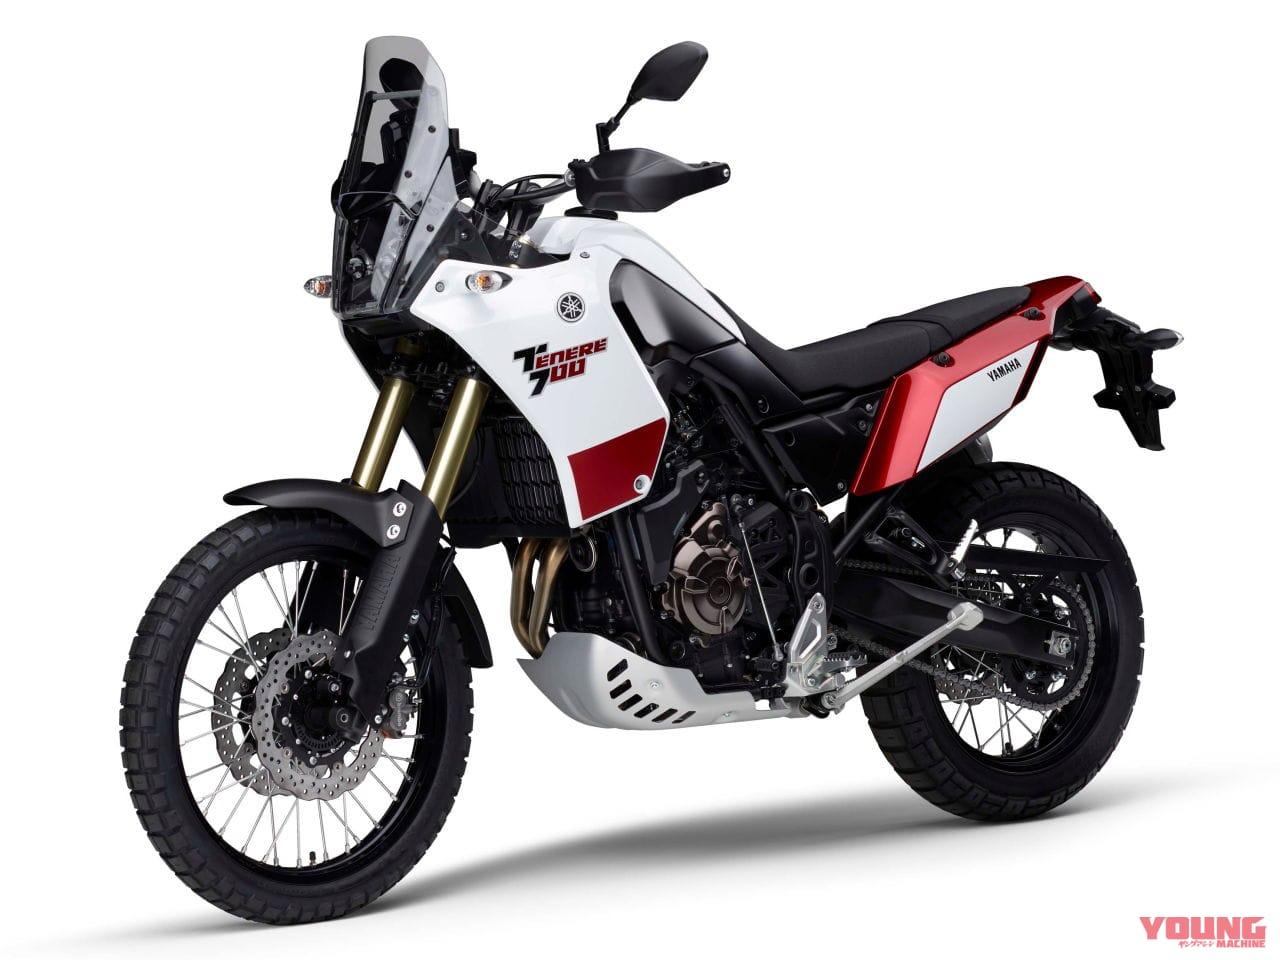 YAMAHA Ténéré 700 ABS[2020]ブルーイッシュホワイトパール1(ホワイト)